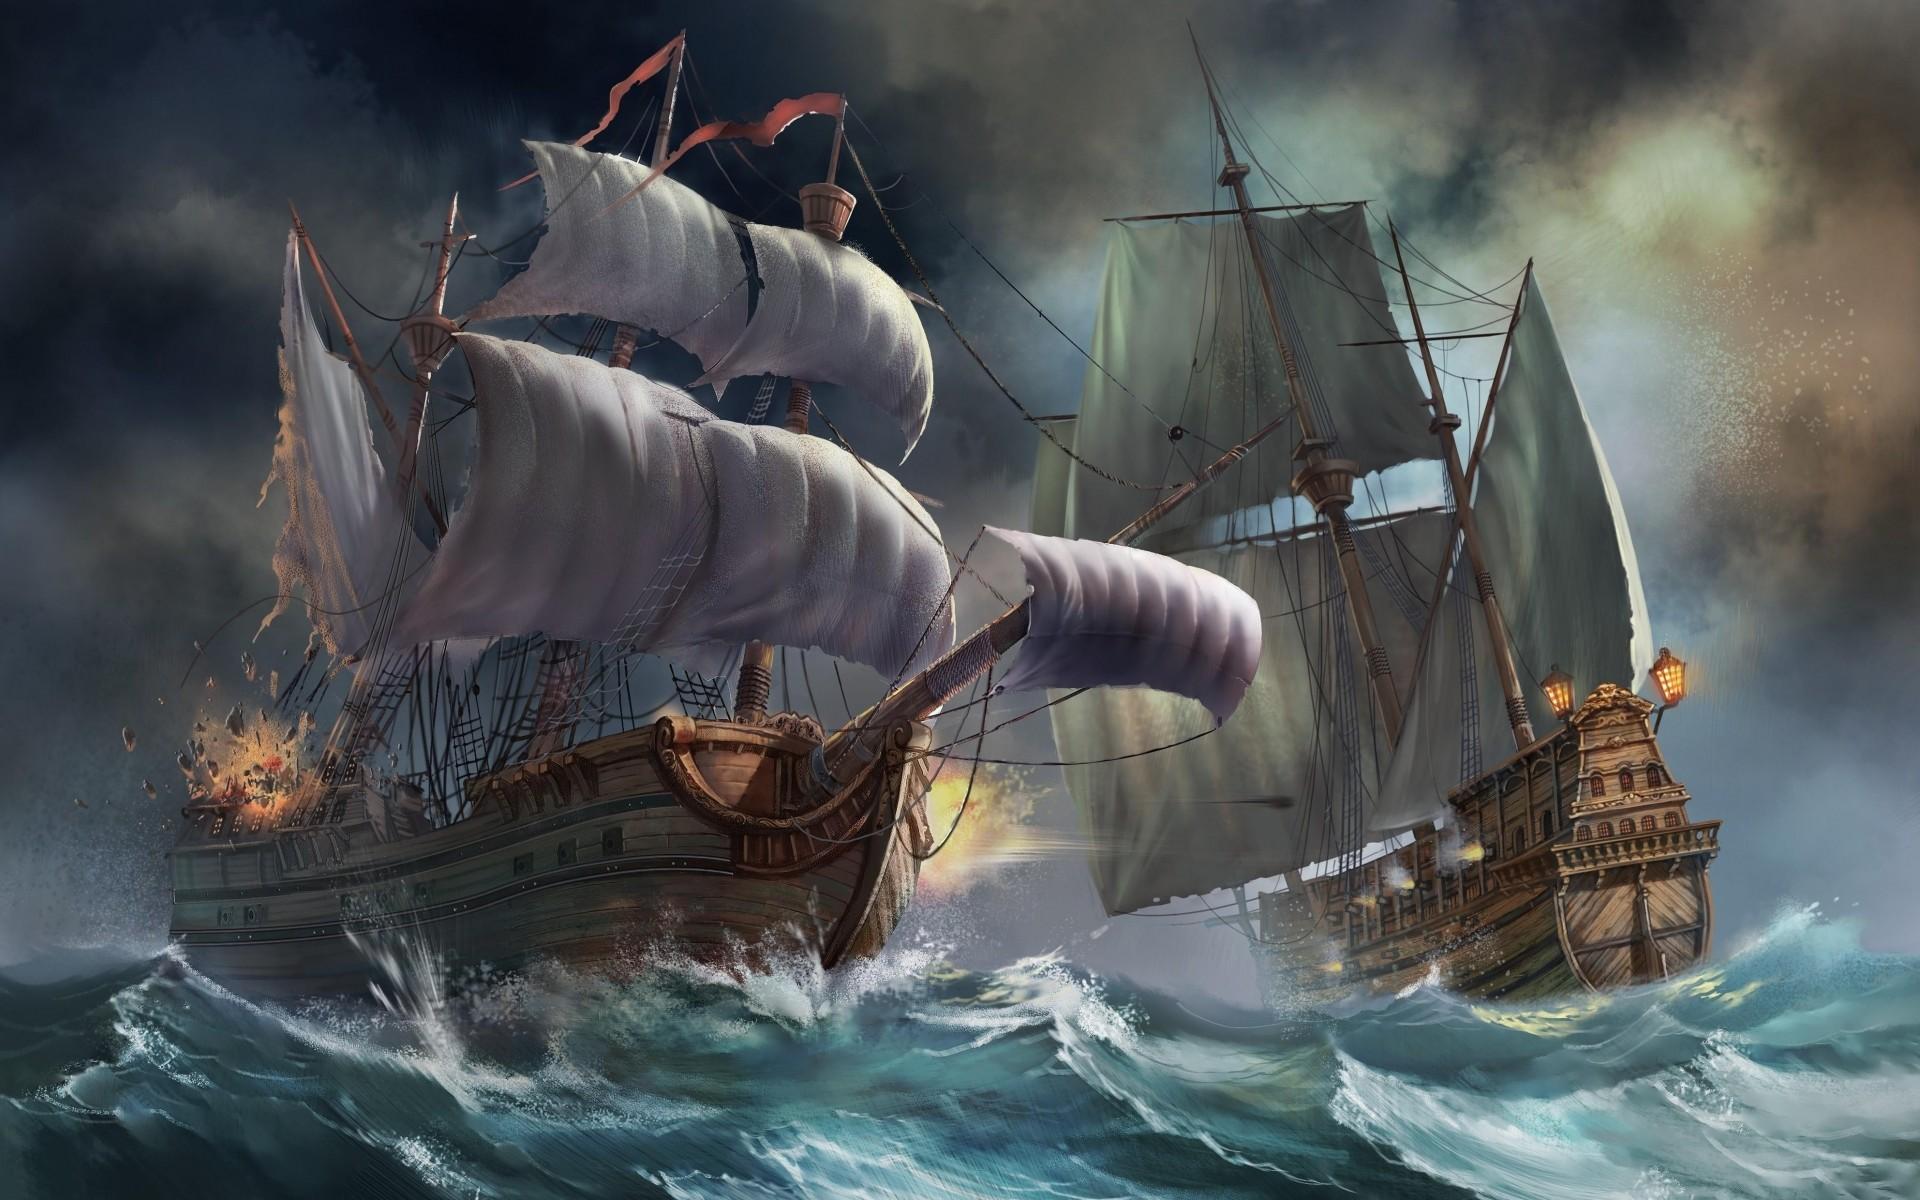 Ships wallpaper images x. Battle clipart pirate ship